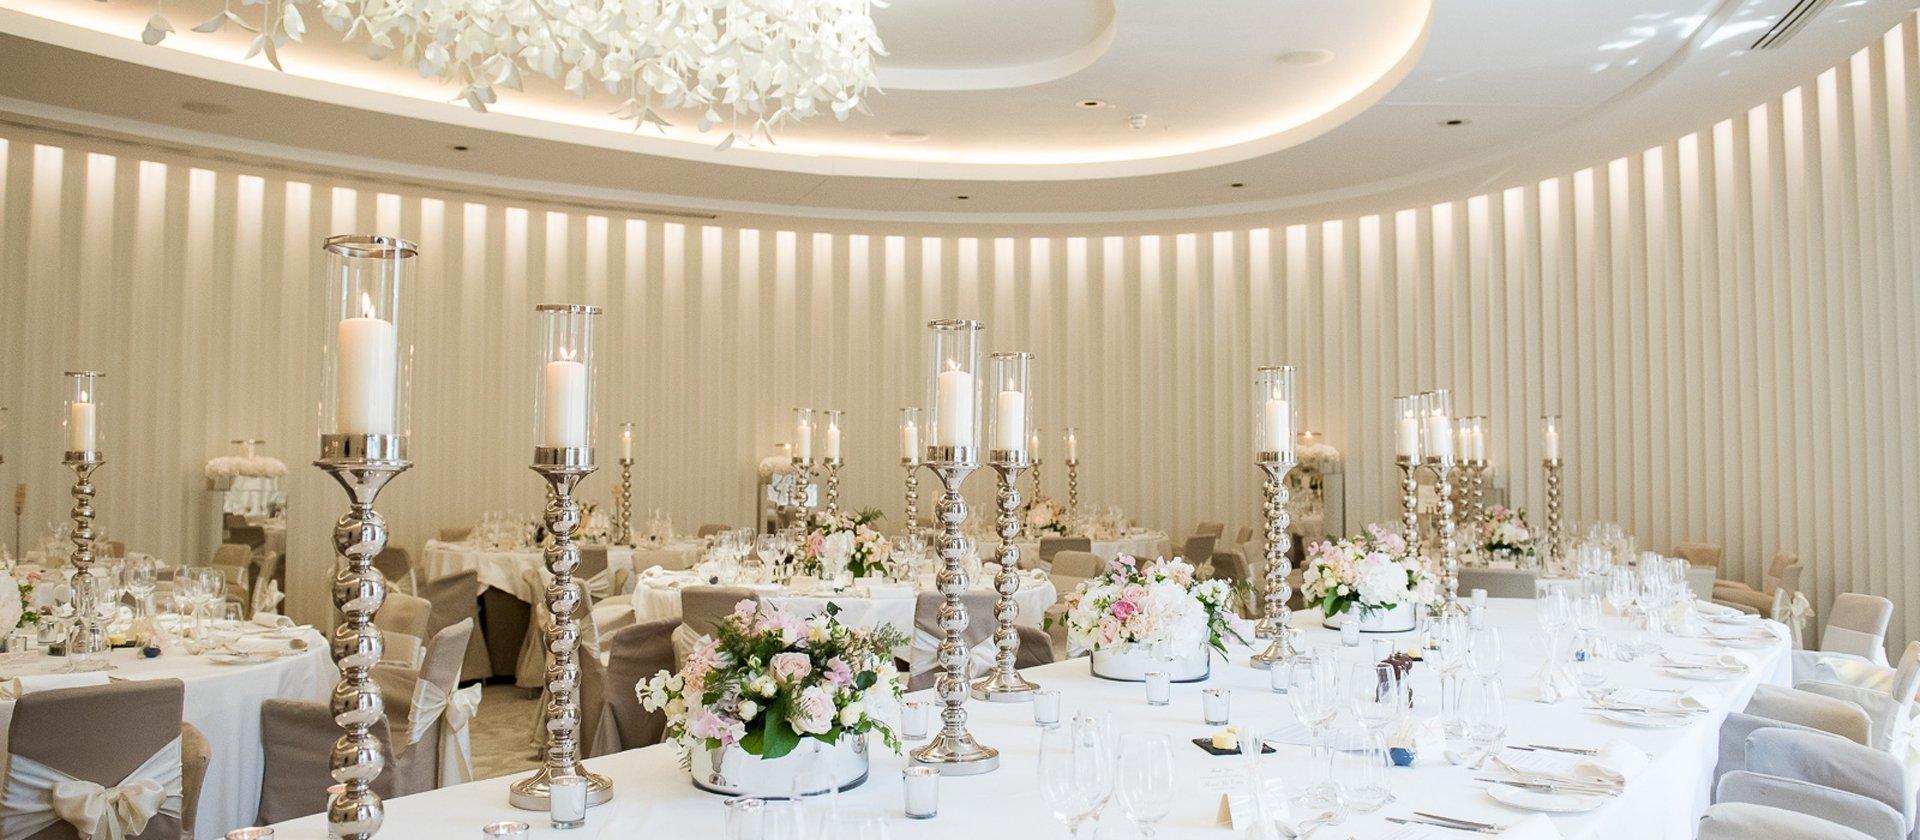 Ascot Wedding Venues Coworth Park Dorchester Collection